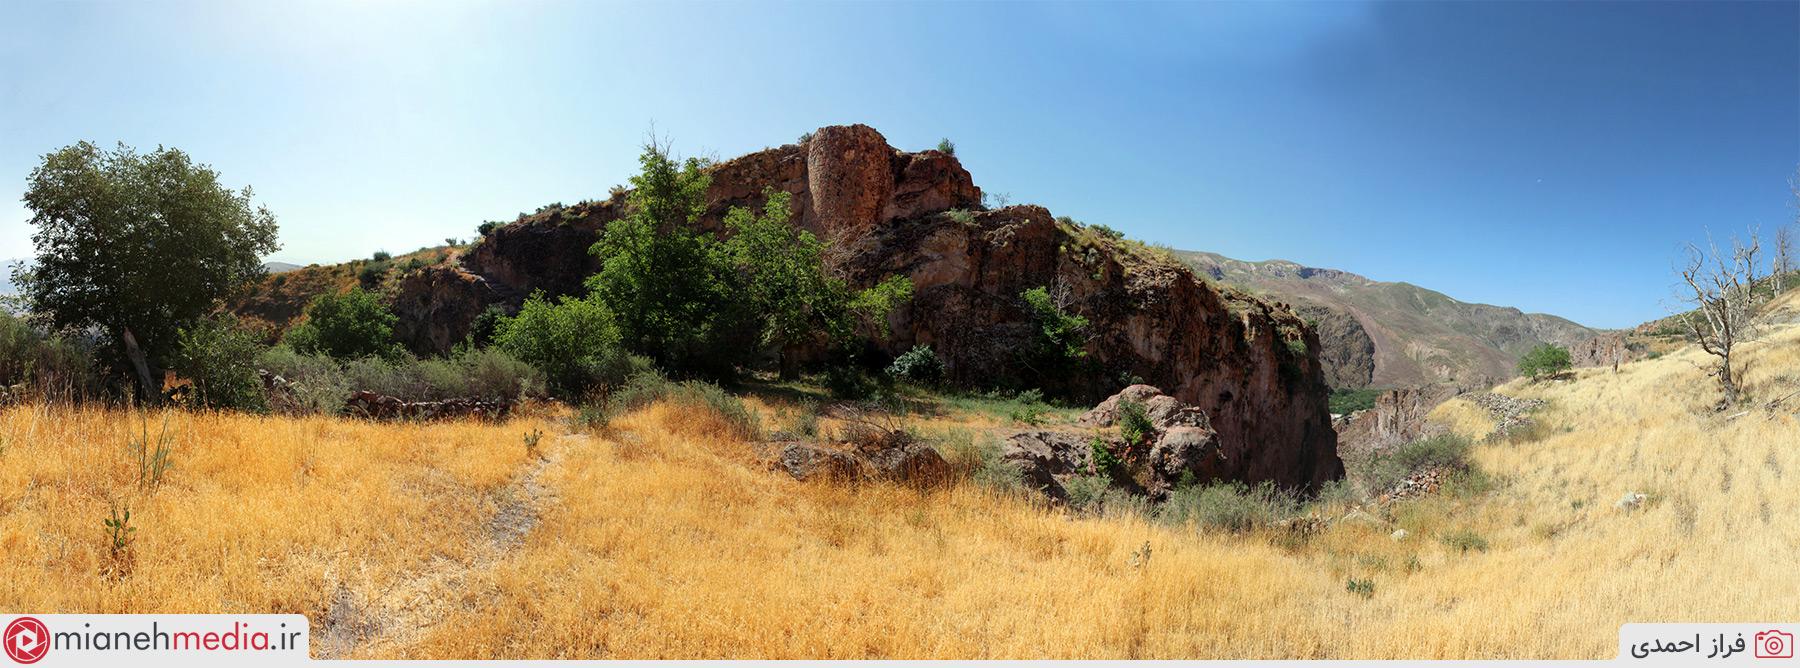 قلعه سنگی کاغذکنان